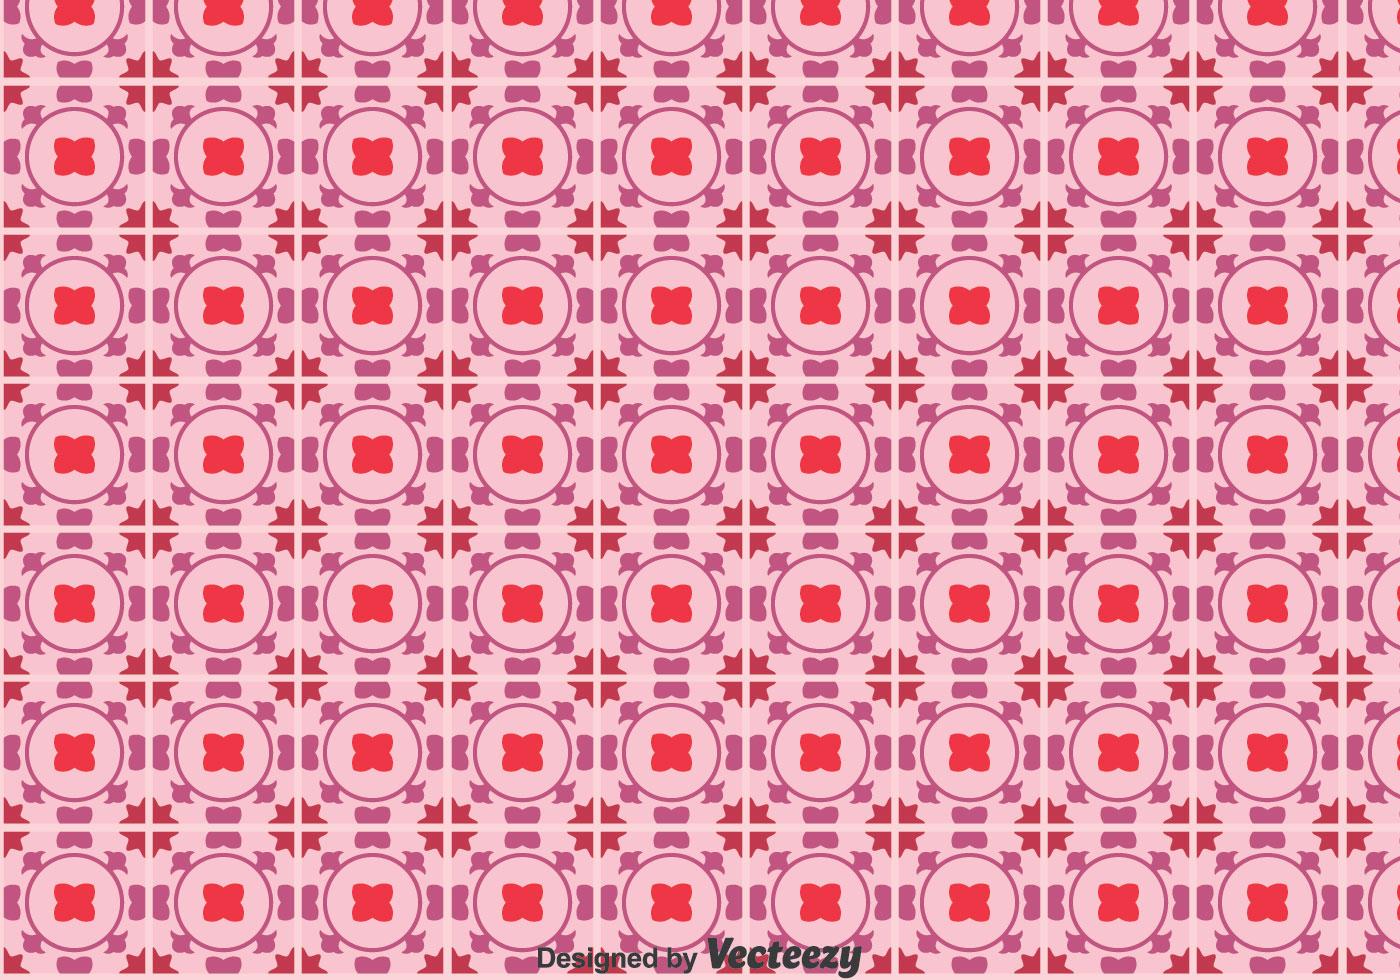 Talavera Purple Tiles Seamless Pattern Download Free Vectors Clipart Graphics